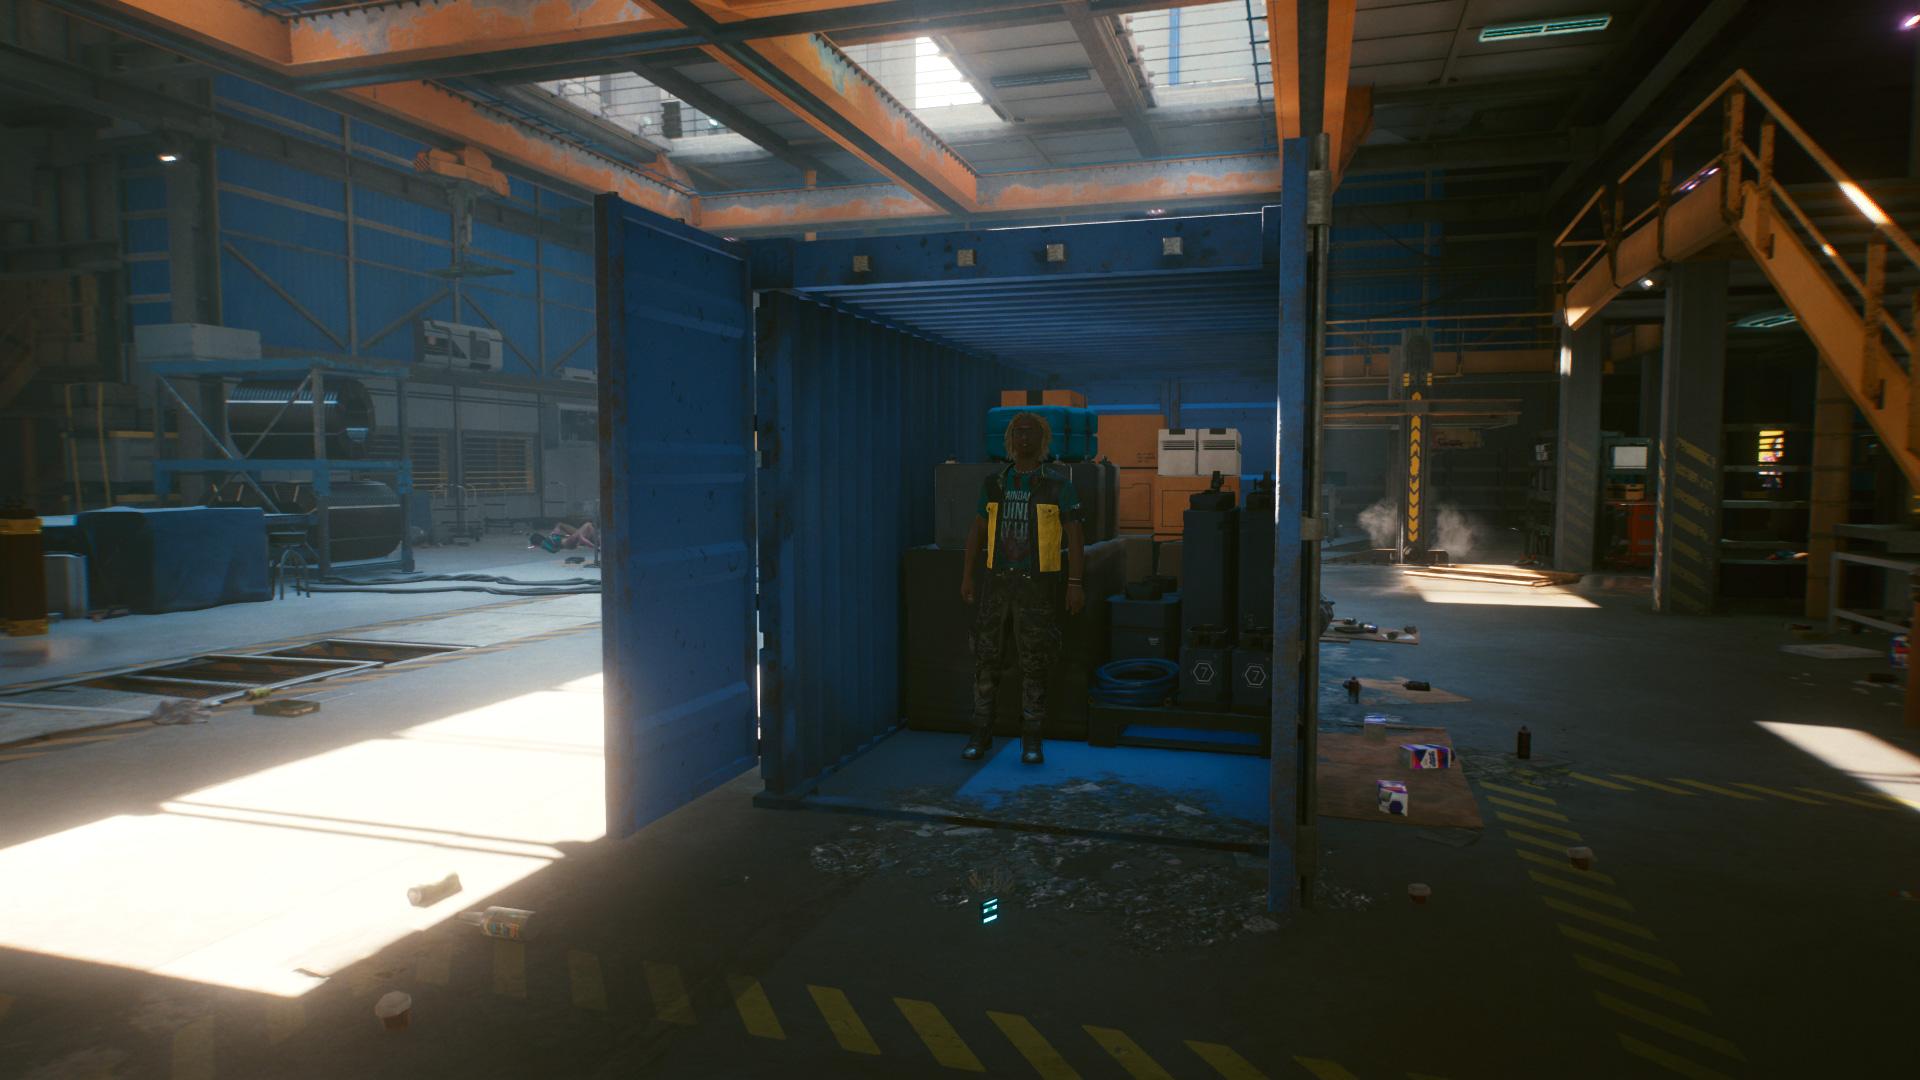 Où trouver Hal Cantos dans Occupational Hazard Gig dans Cyberpunk 2077